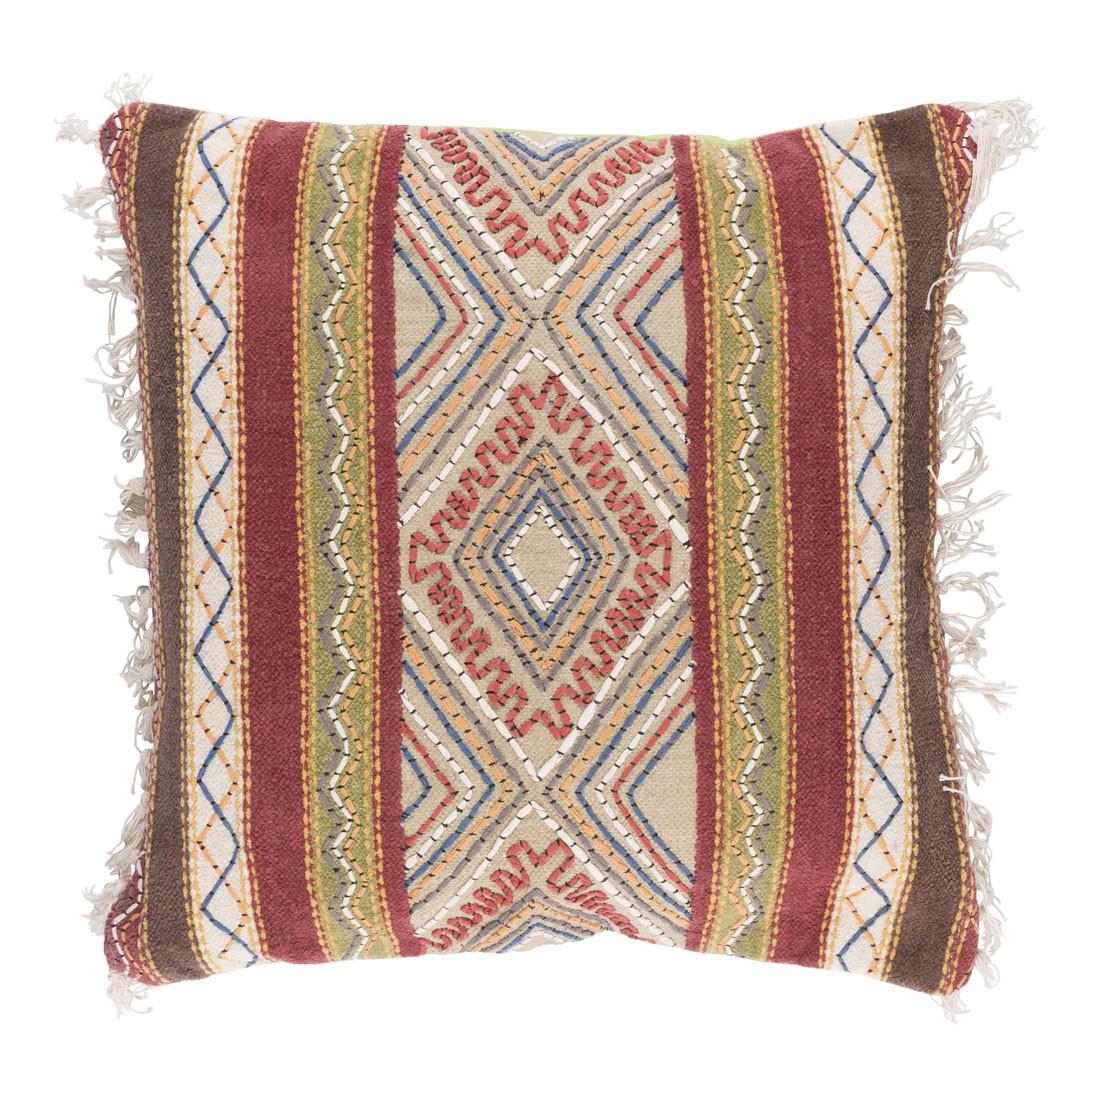 Boho Chic Gitana Pillow - MR-004 20 x 20 inches Cotton